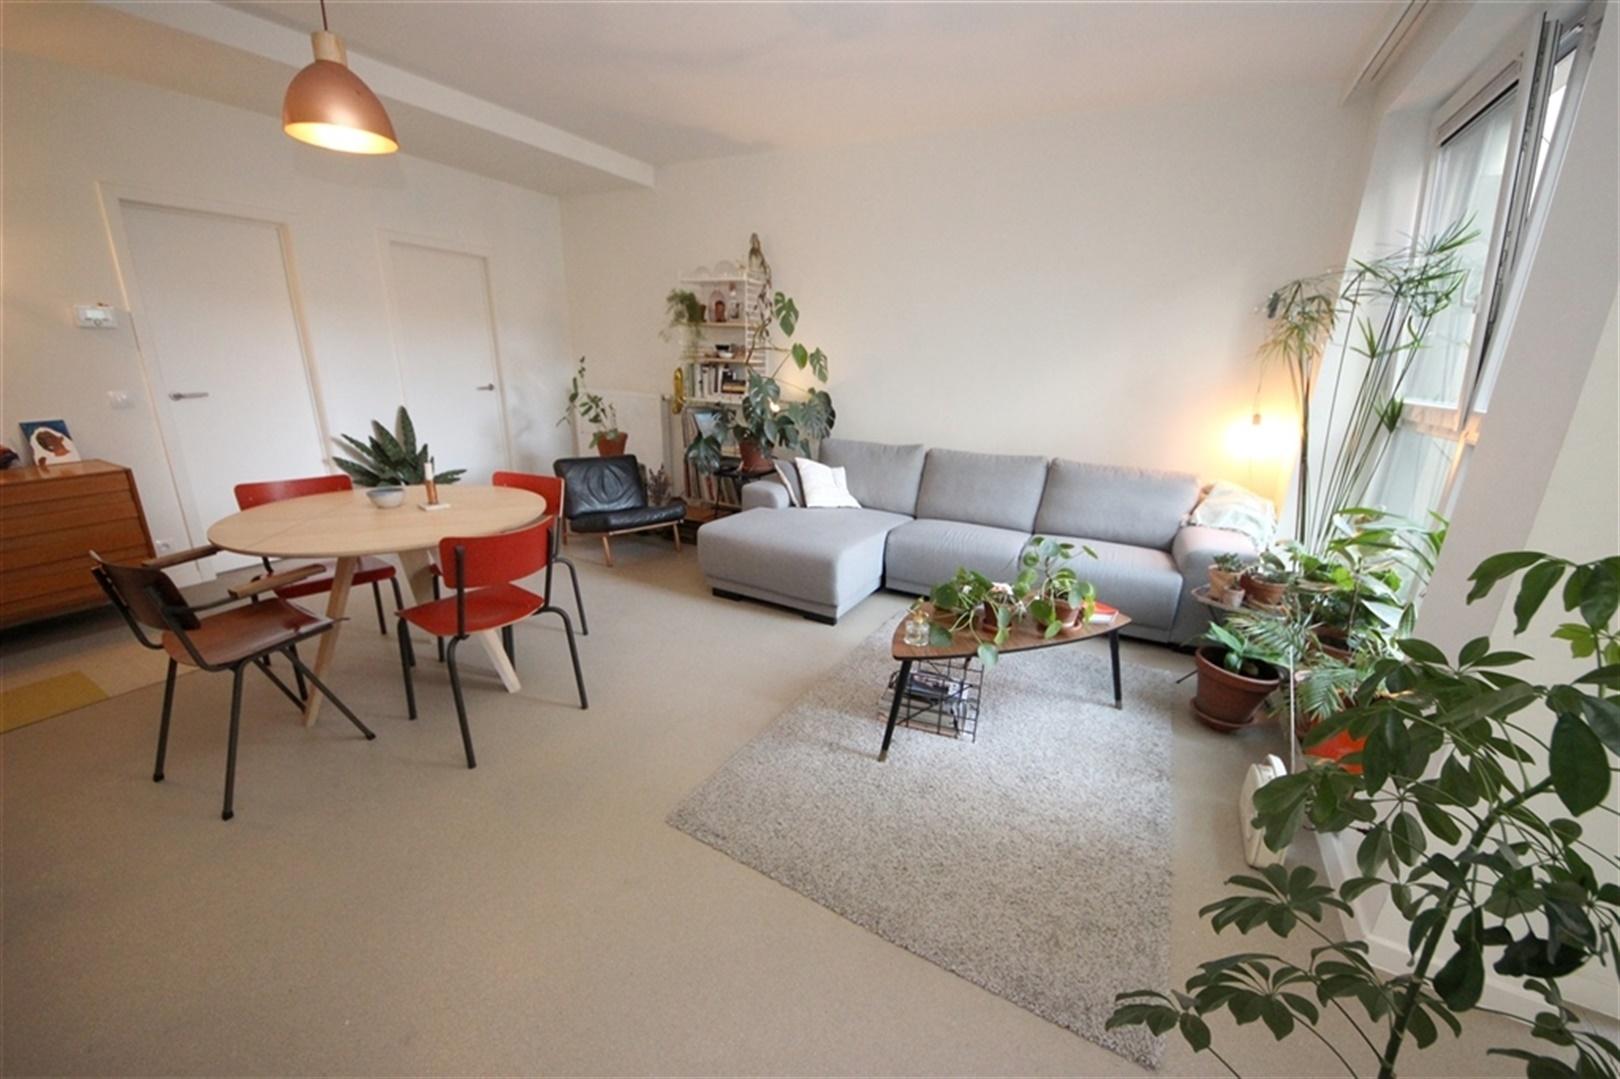 2-slaapkamer appartement mét 2 badkamers nabij Sint-Annaplein